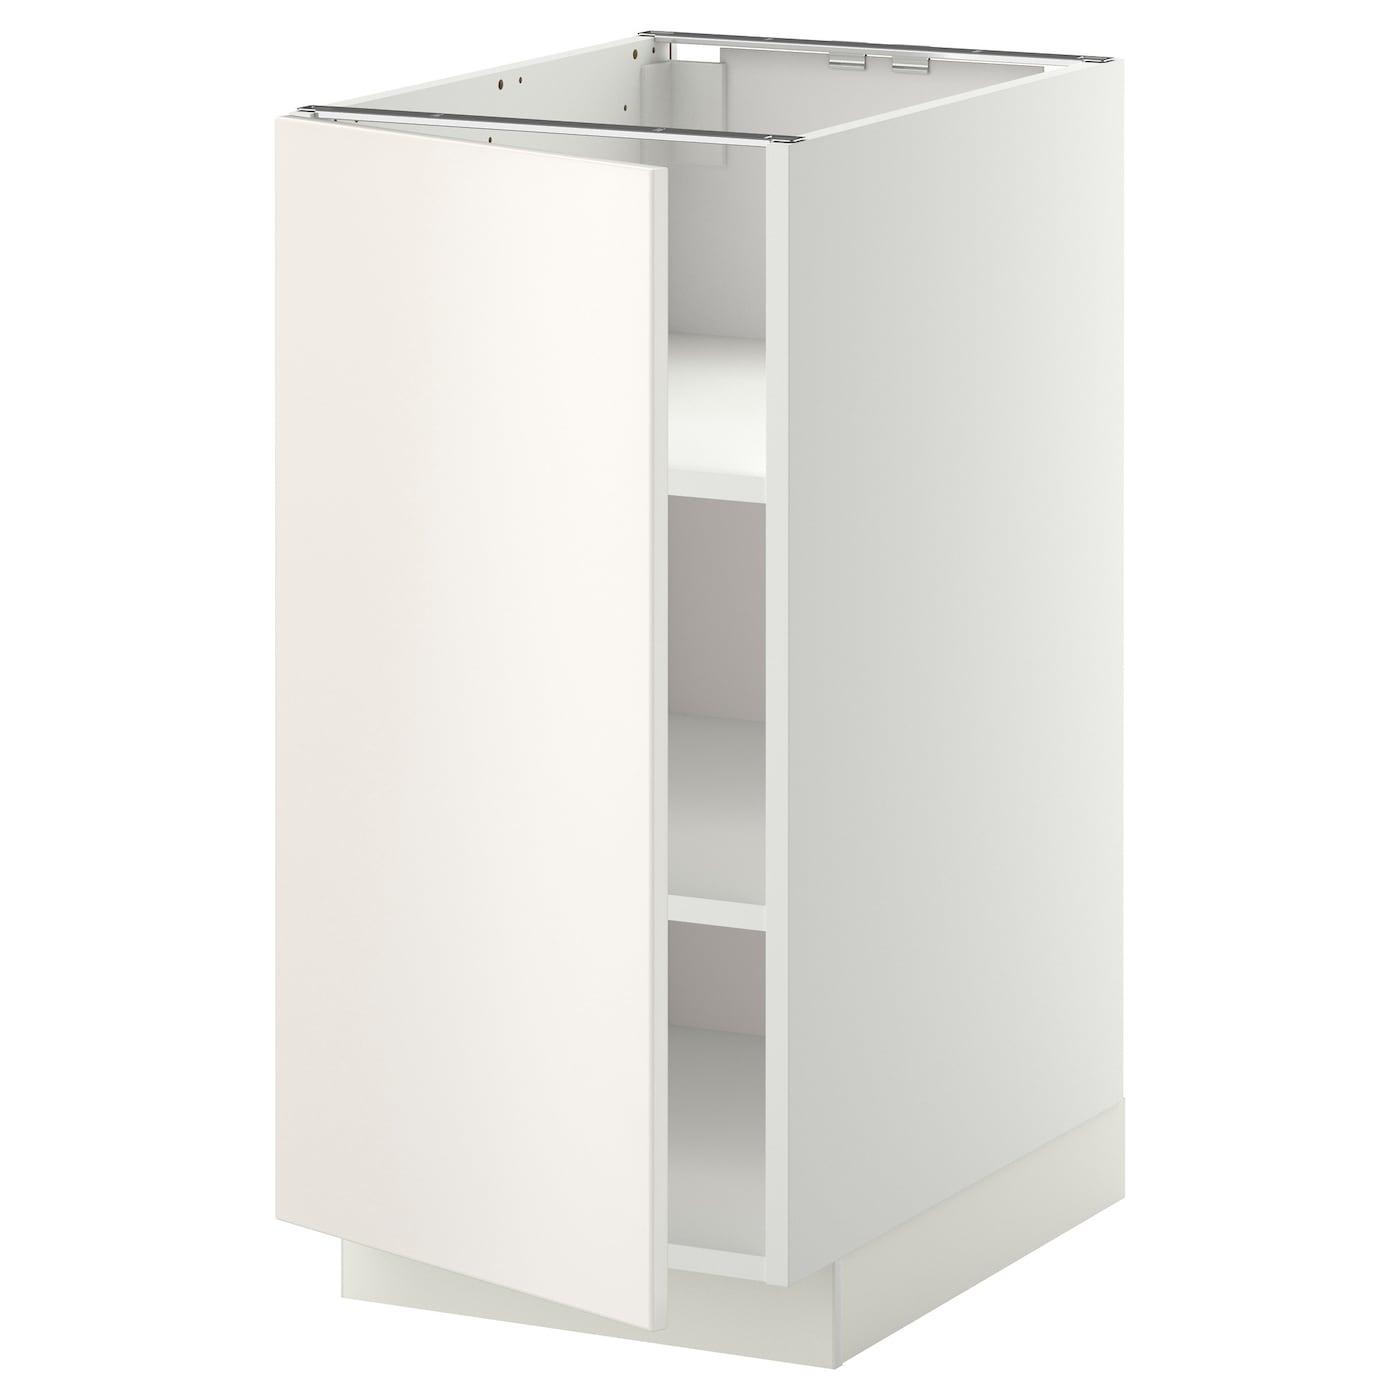 Metod Base Cabinet With Shelves White Veddinge